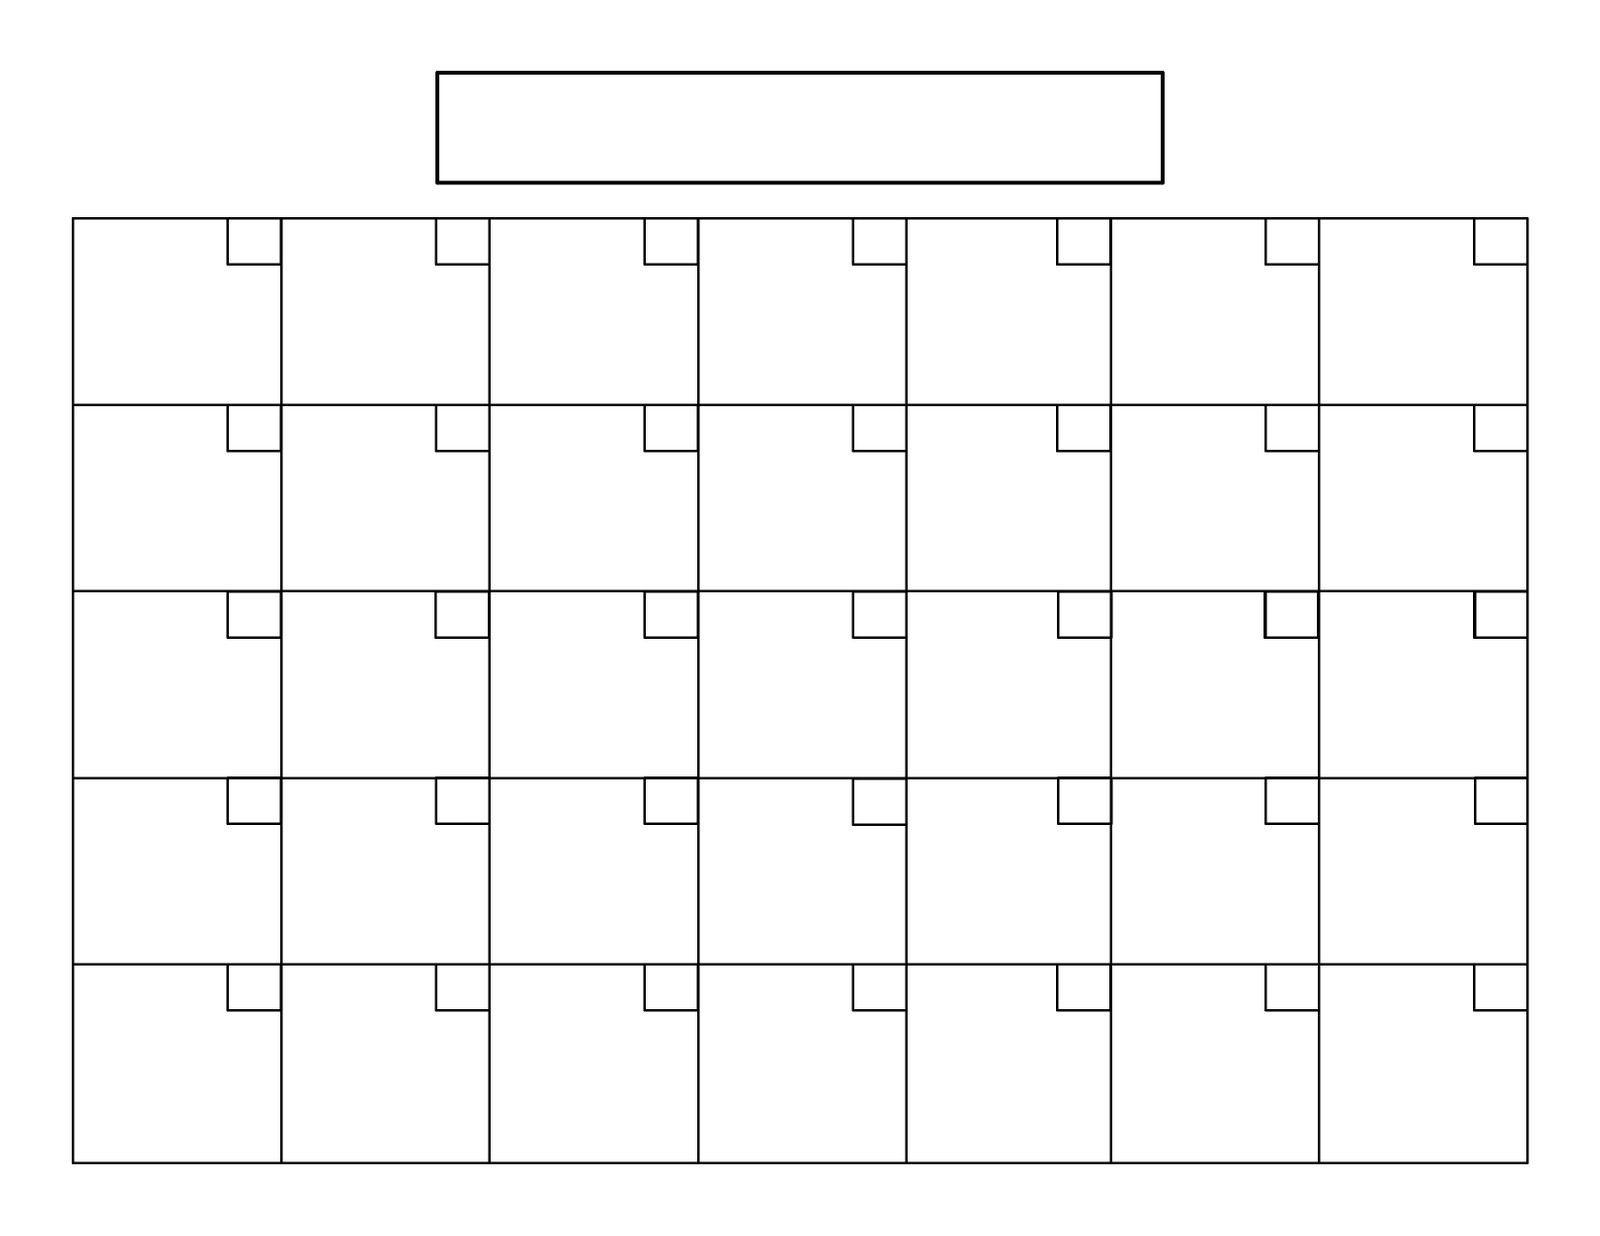 Blank Day Calendar | Otohondalongan within 31 Day Blank Calendar Template